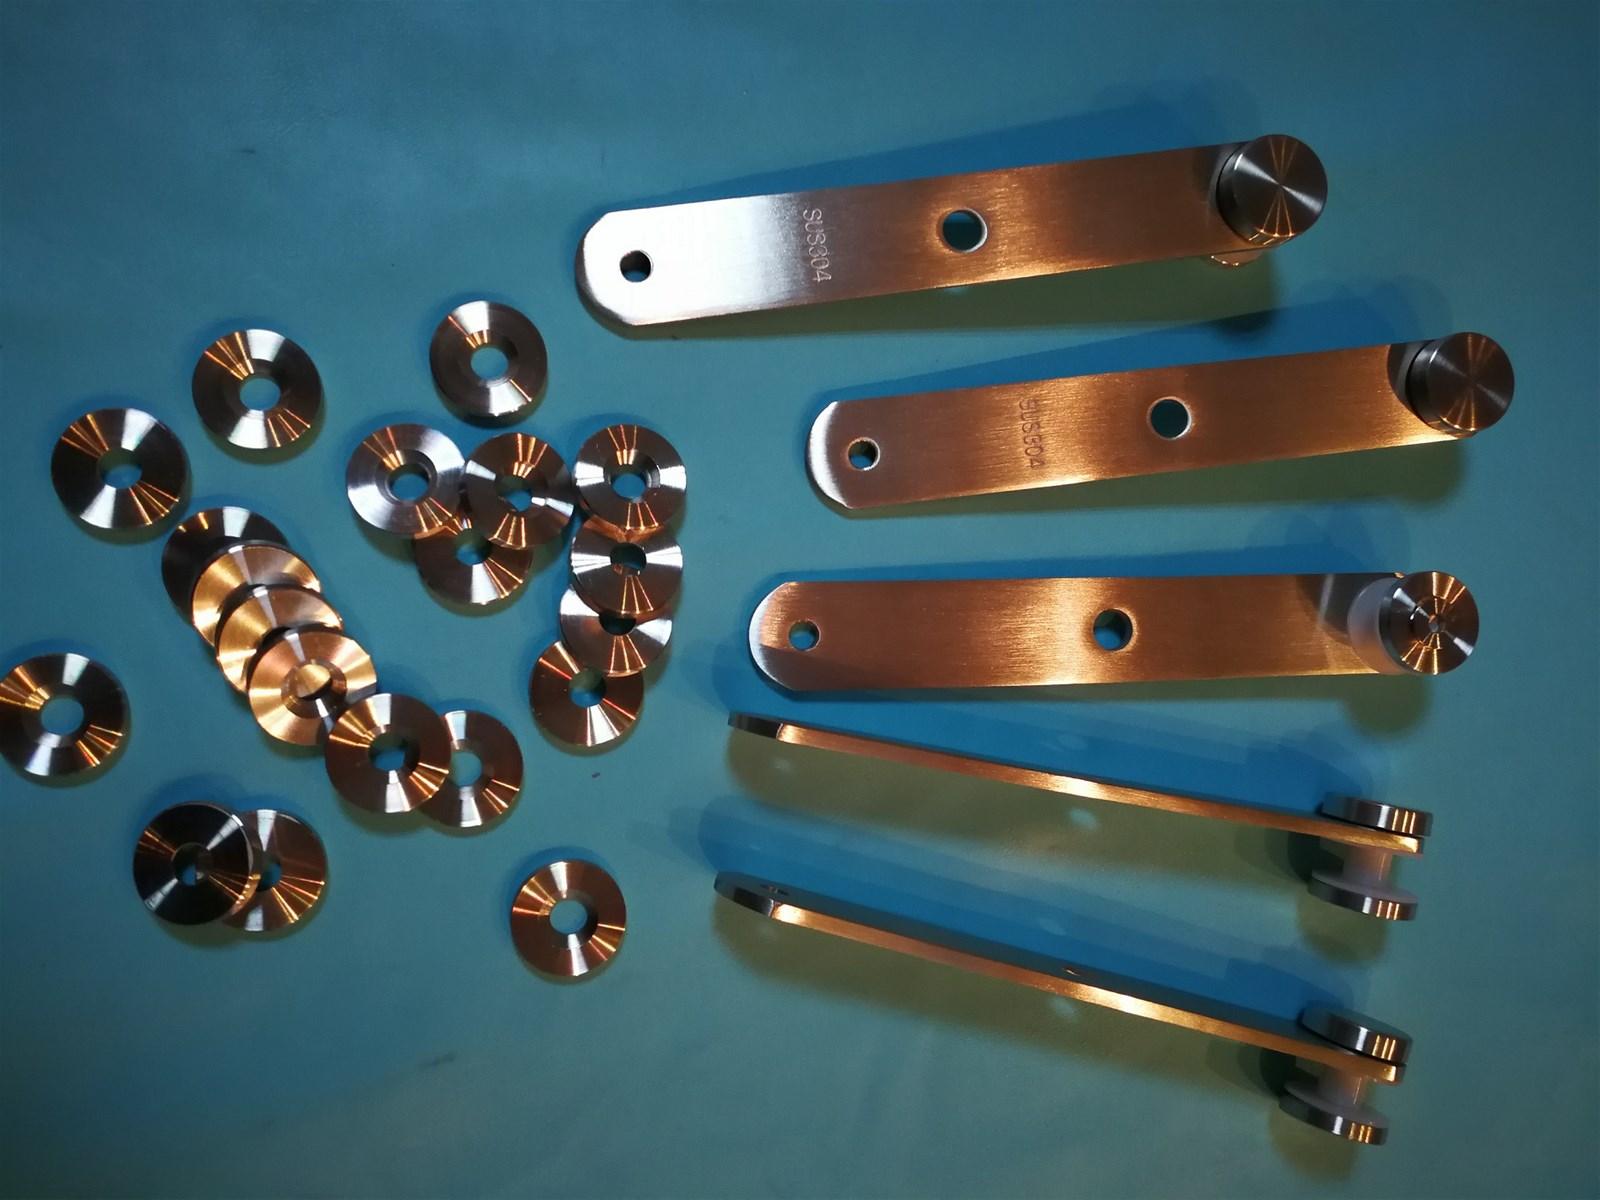 Hardware FittingsFlooring Handrail AccessoriesStainless Steel HandlesAccessories